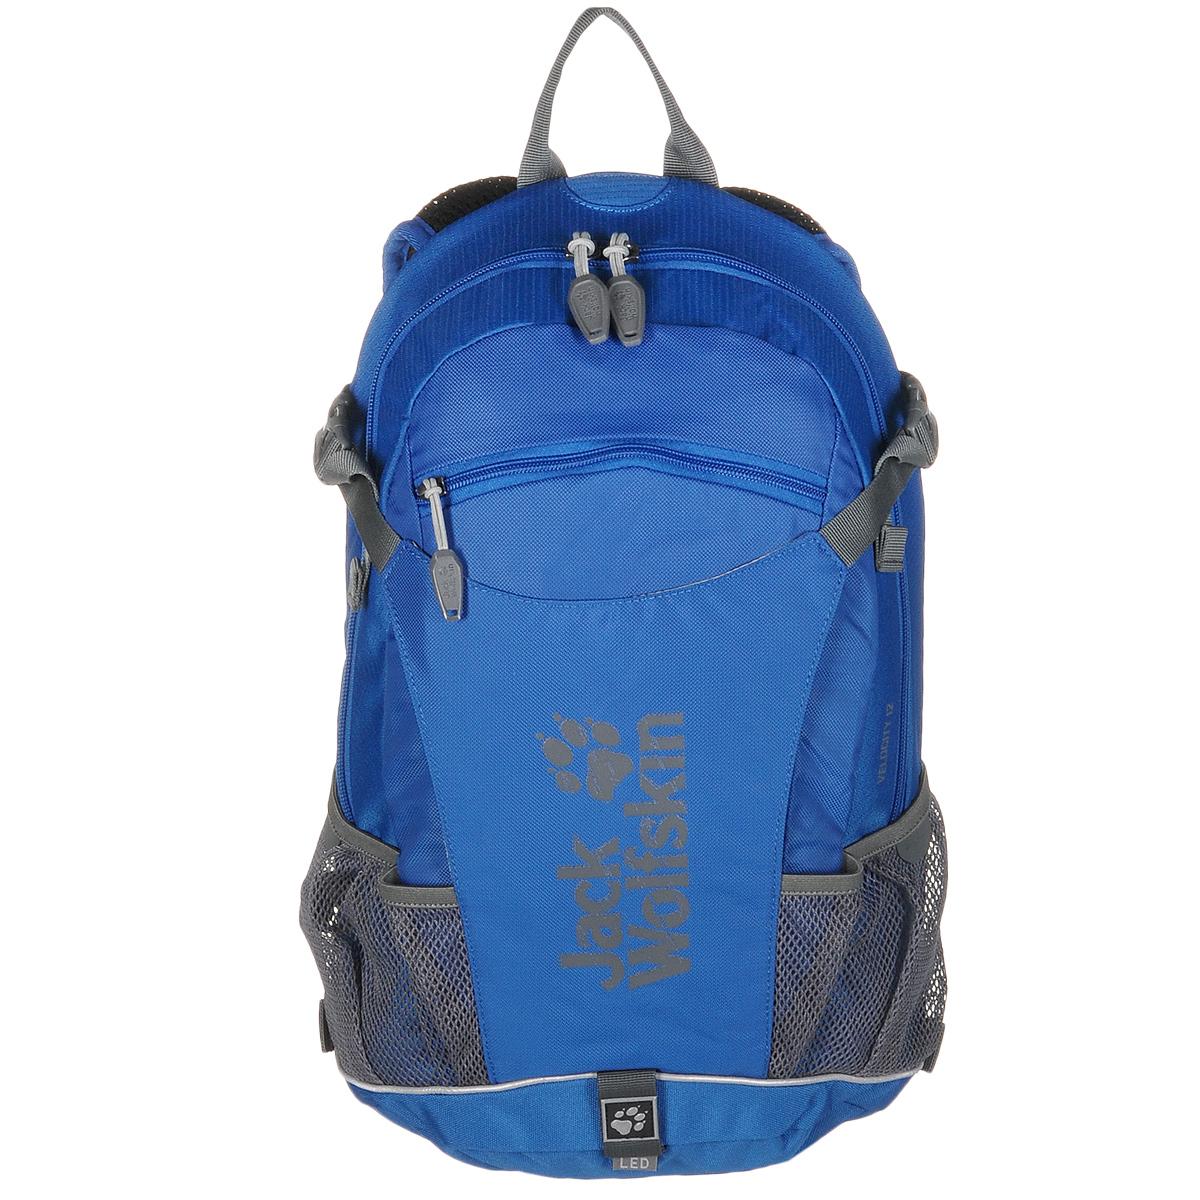 Рюкзак спортивный Jack Wolfskin Velocity 12, цвет: синий, 12 л